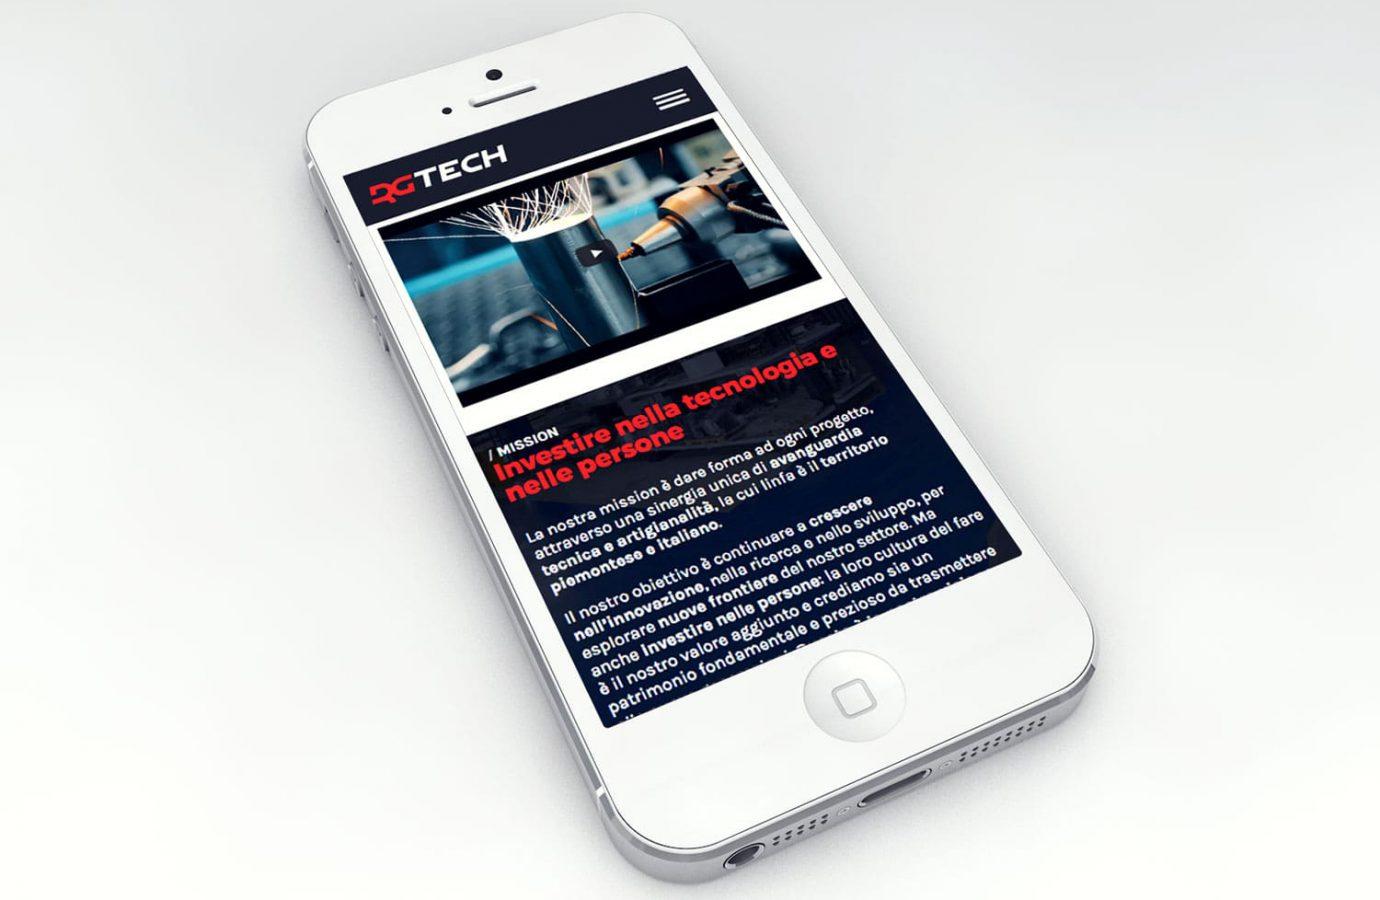 WillBe - web design Rgtech mobile